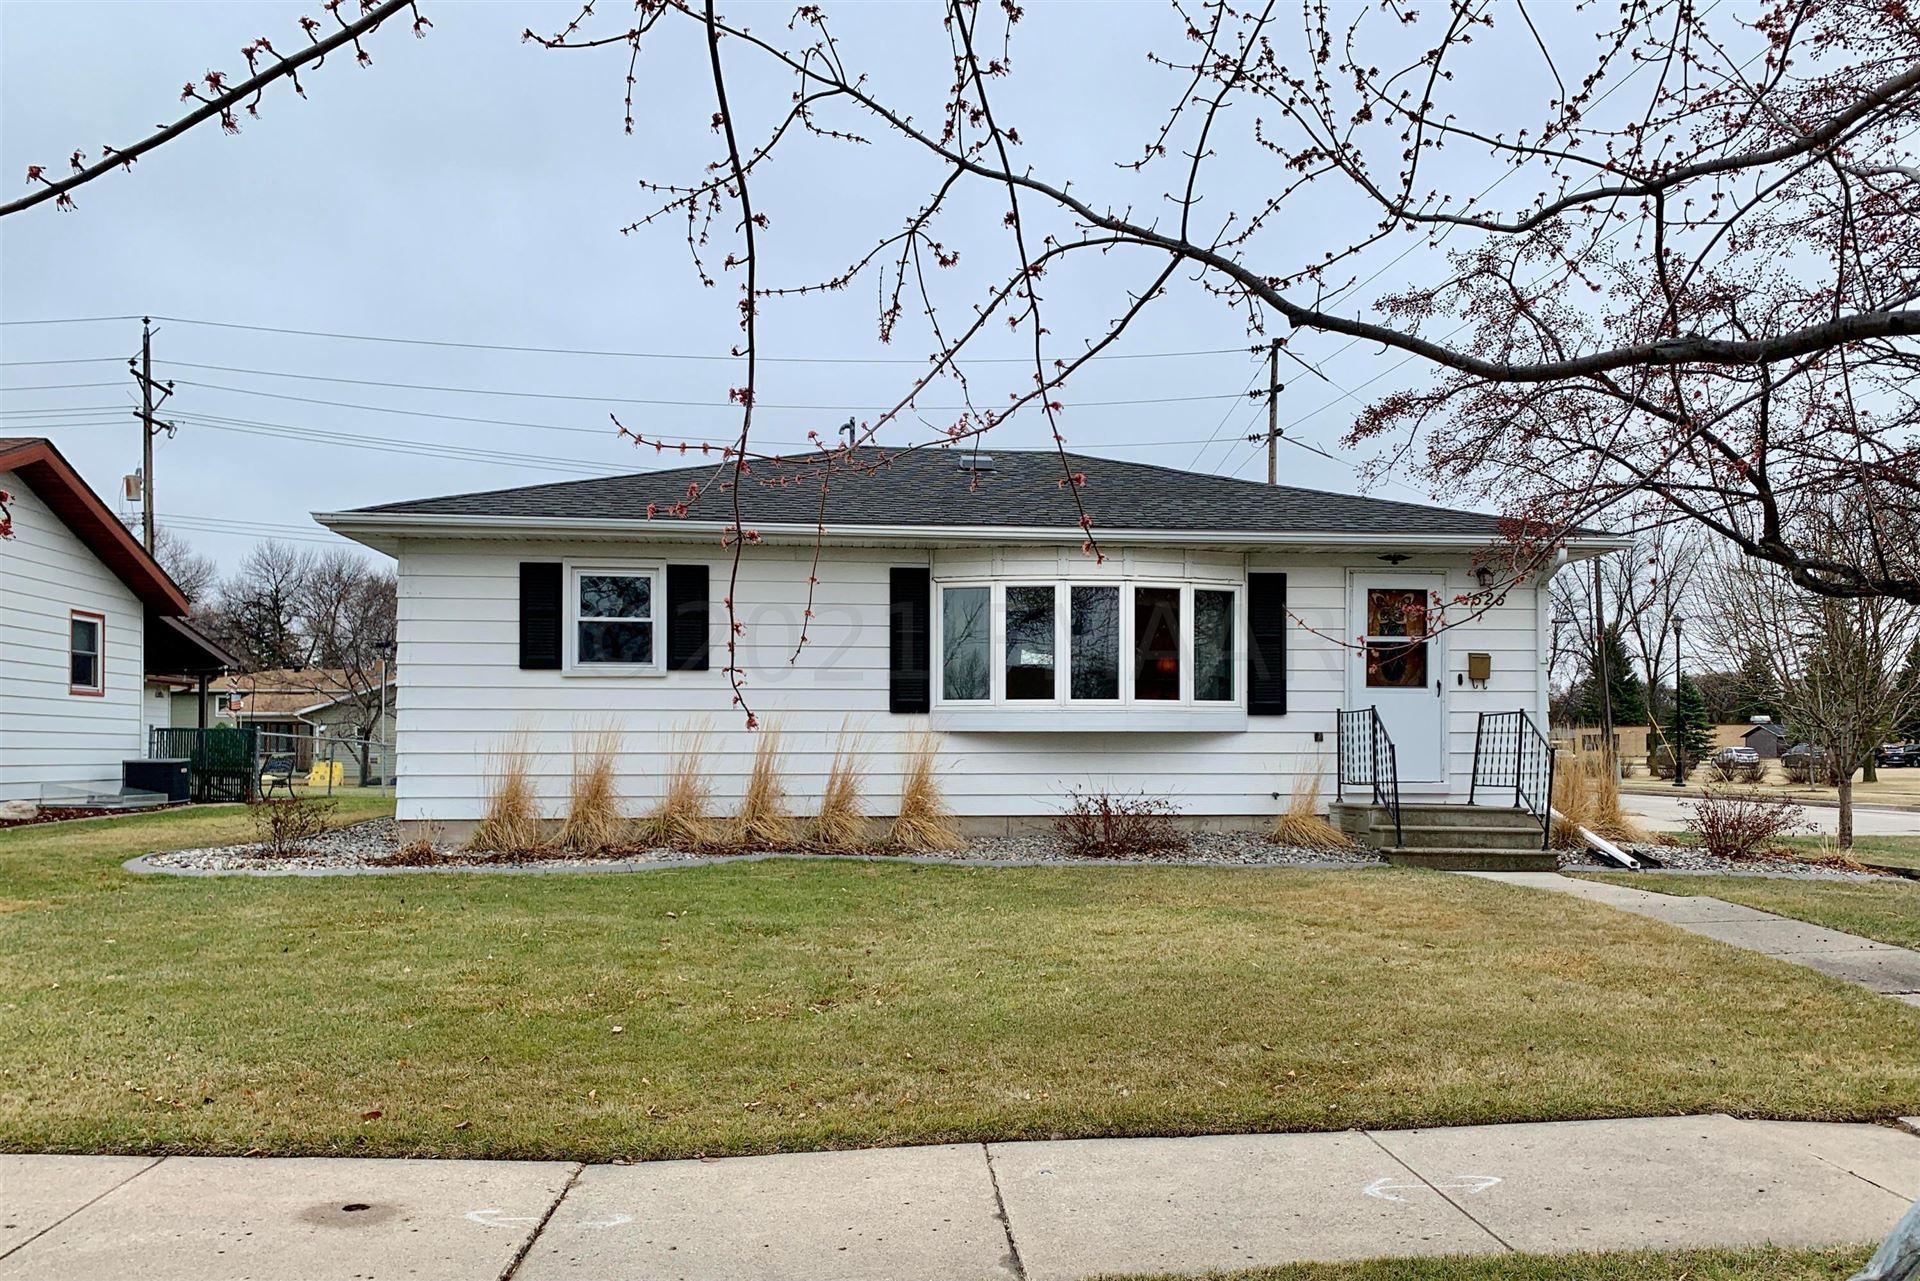 1626 17 Street S, Fargo, ND 58103 - #: 21-1821